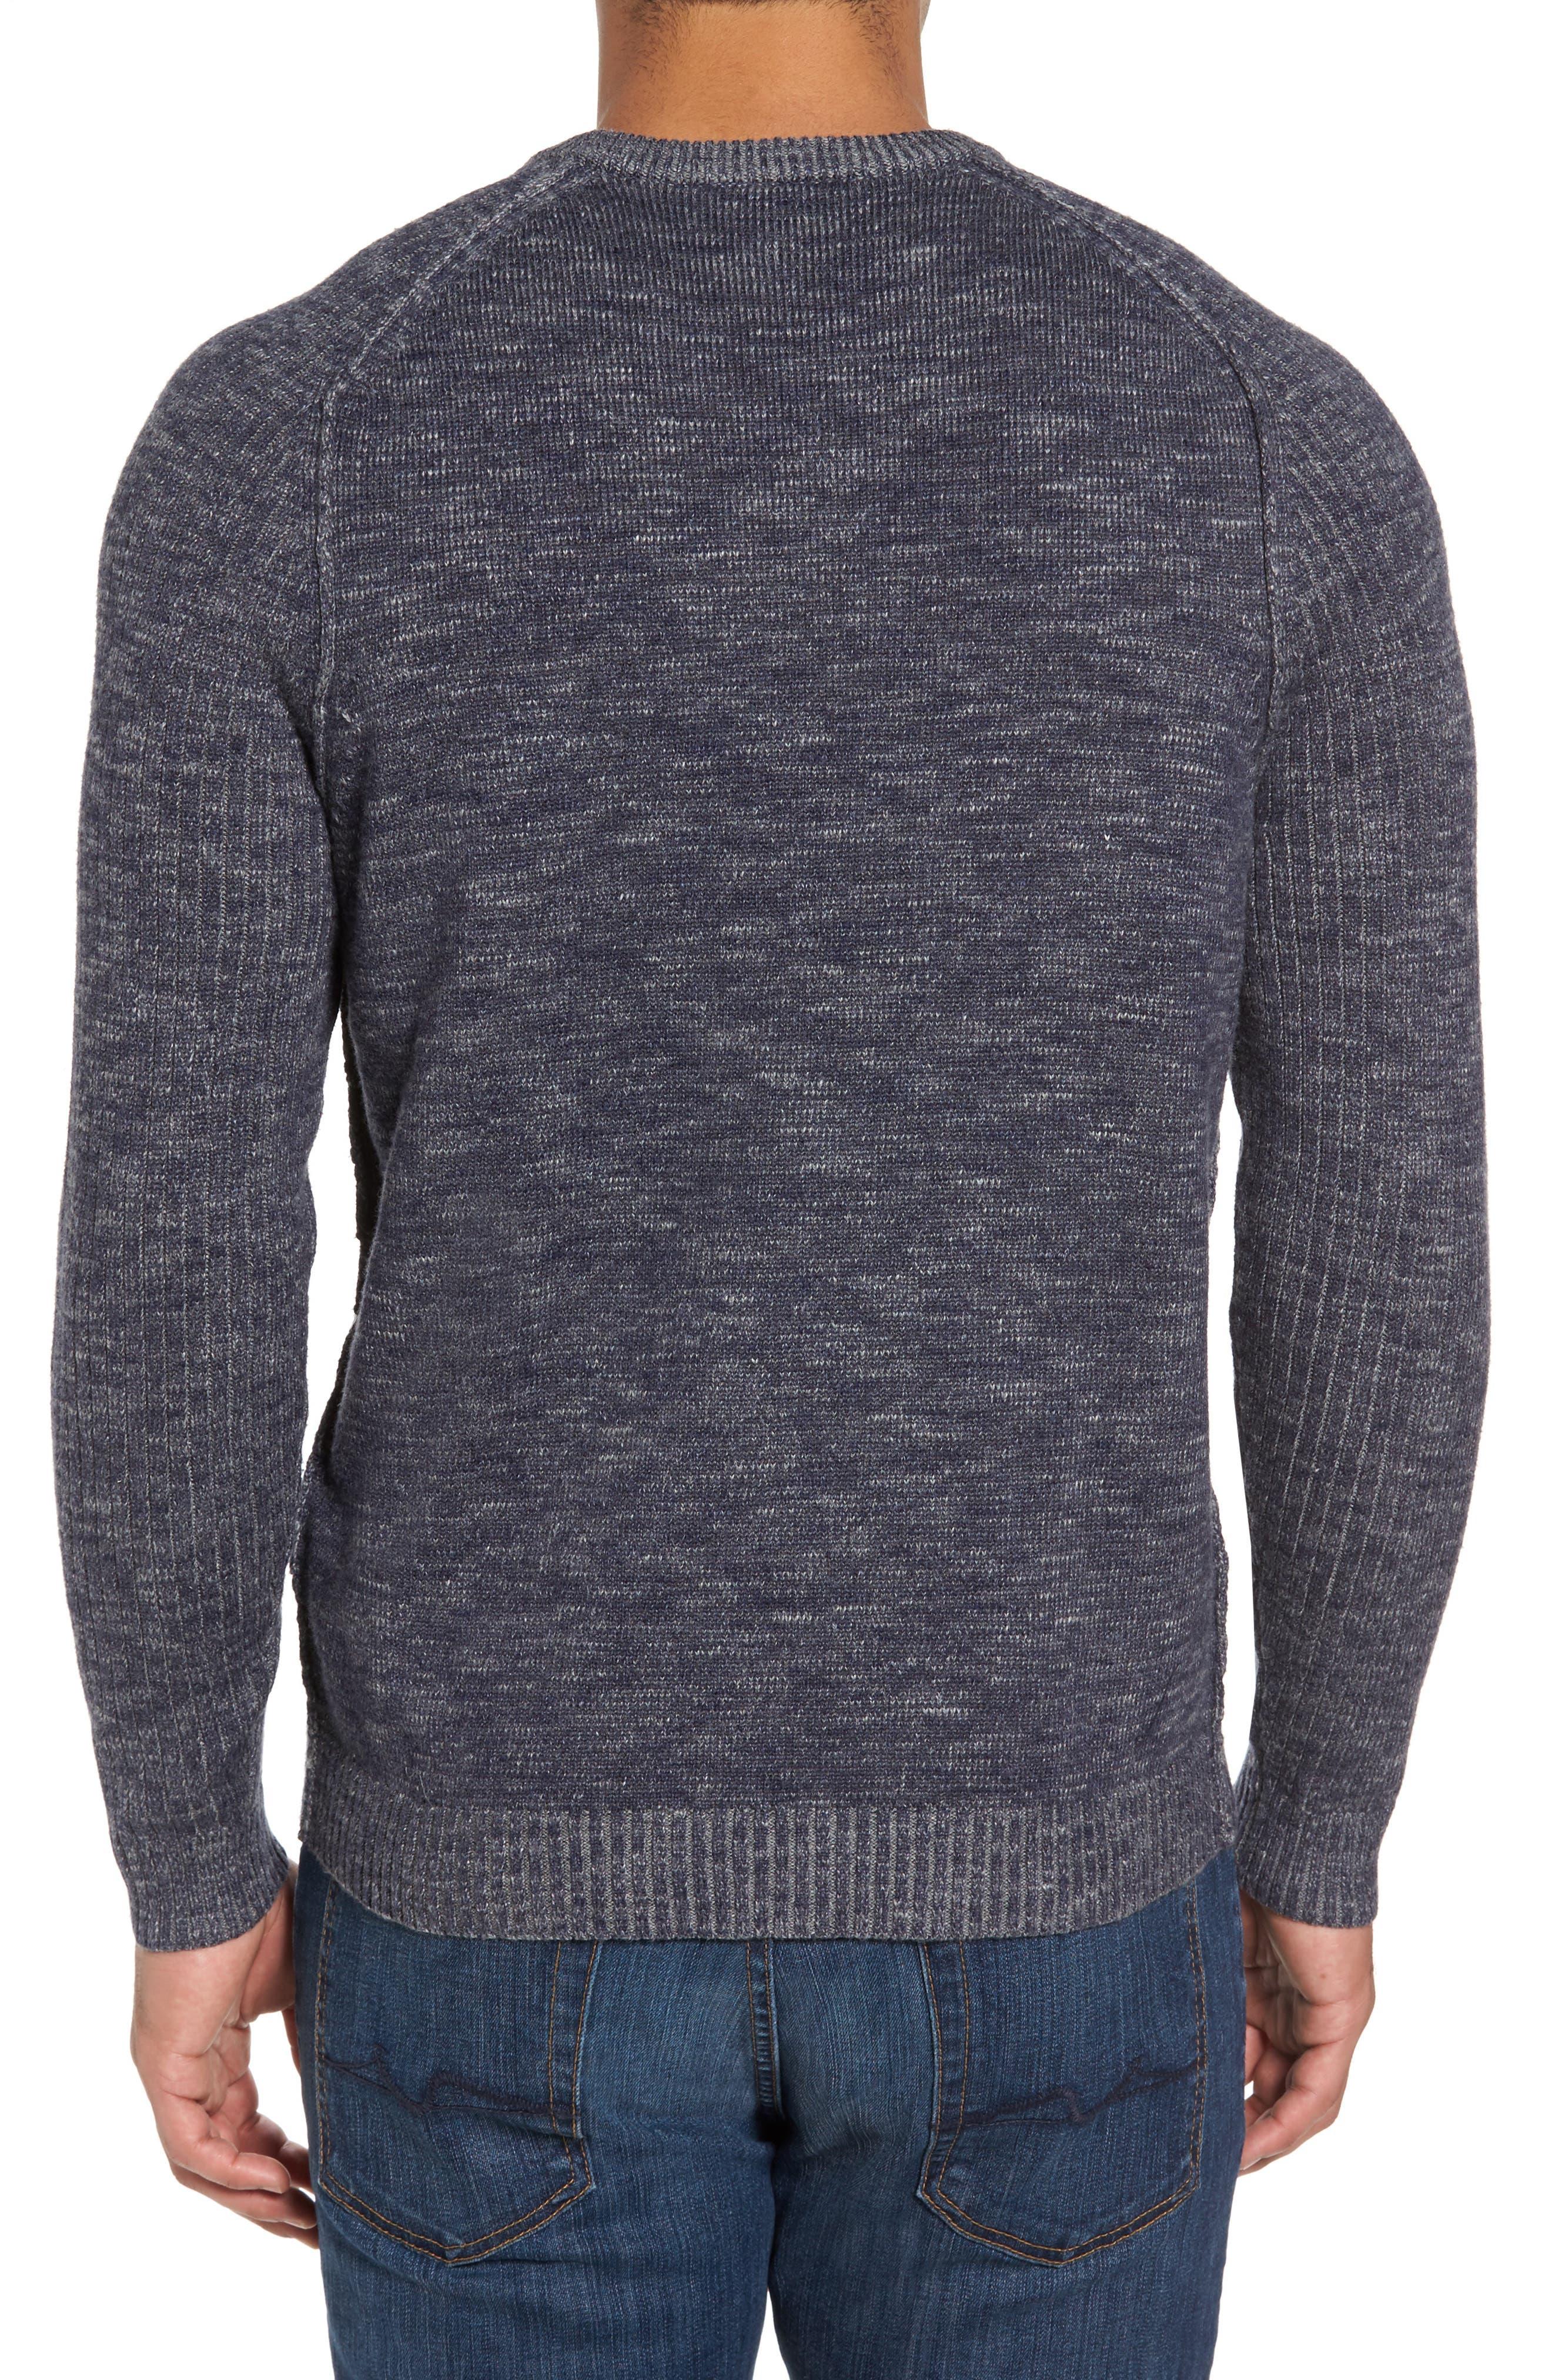 Gran Rey Flip Reversible Cotton & Wool Sweater,                             Alternate thumbnail 2, color,                             Ocean Deep Heather